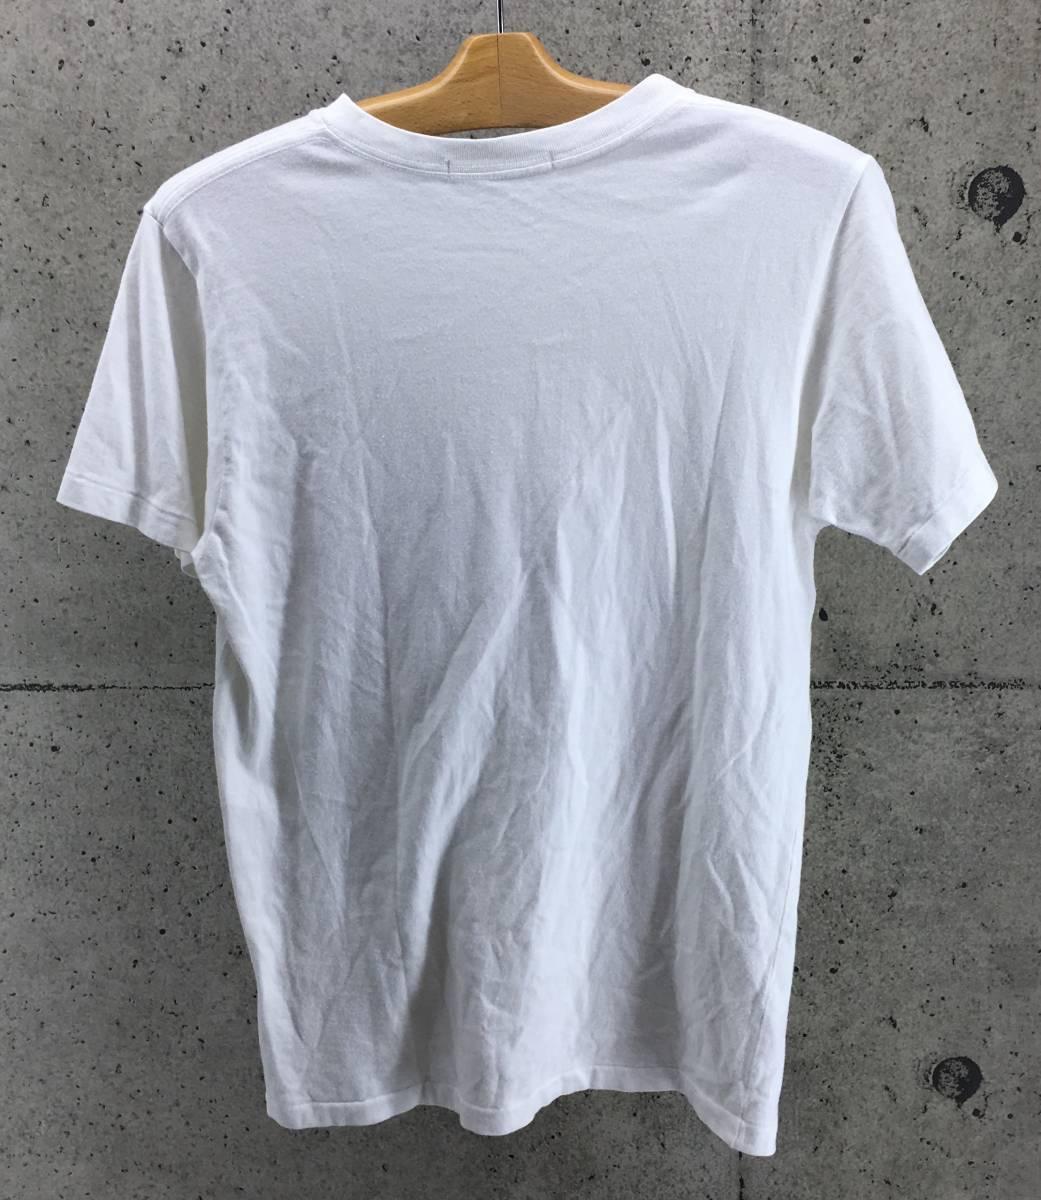 zucca ズッカ FUJIYAMA NEW ROCK SOUVENIR Tシャツ M ホワイト系 記念Tシャツ トップス 18082801_画像2